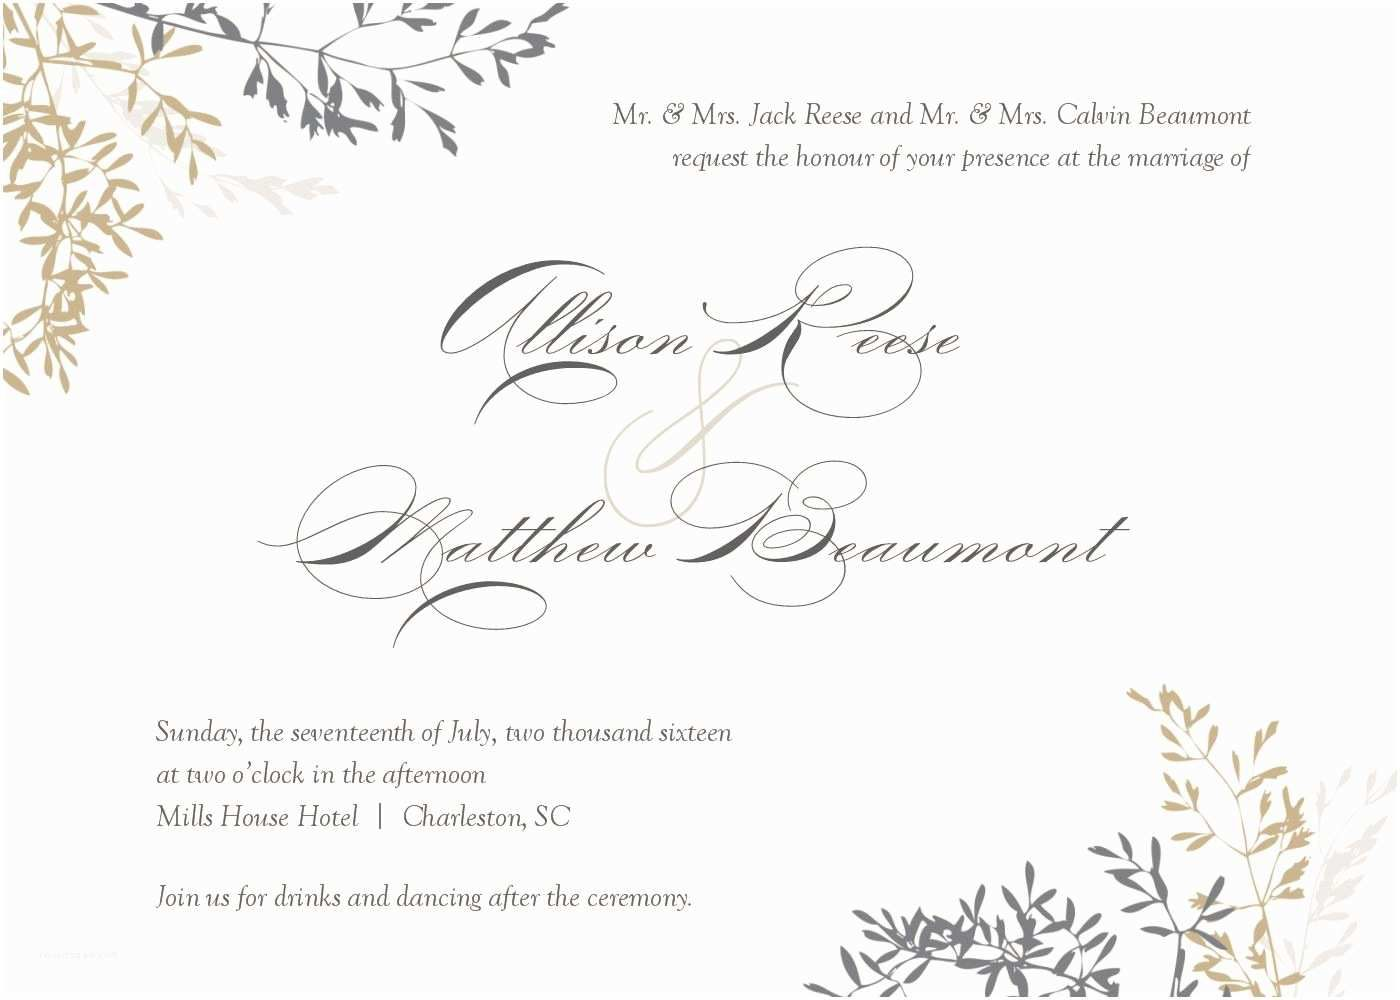 010 Stupendou Wedding Invitation Template Word Highest Quality  Invite Wording Uk Anniversary Microsoft Free MarriageFull